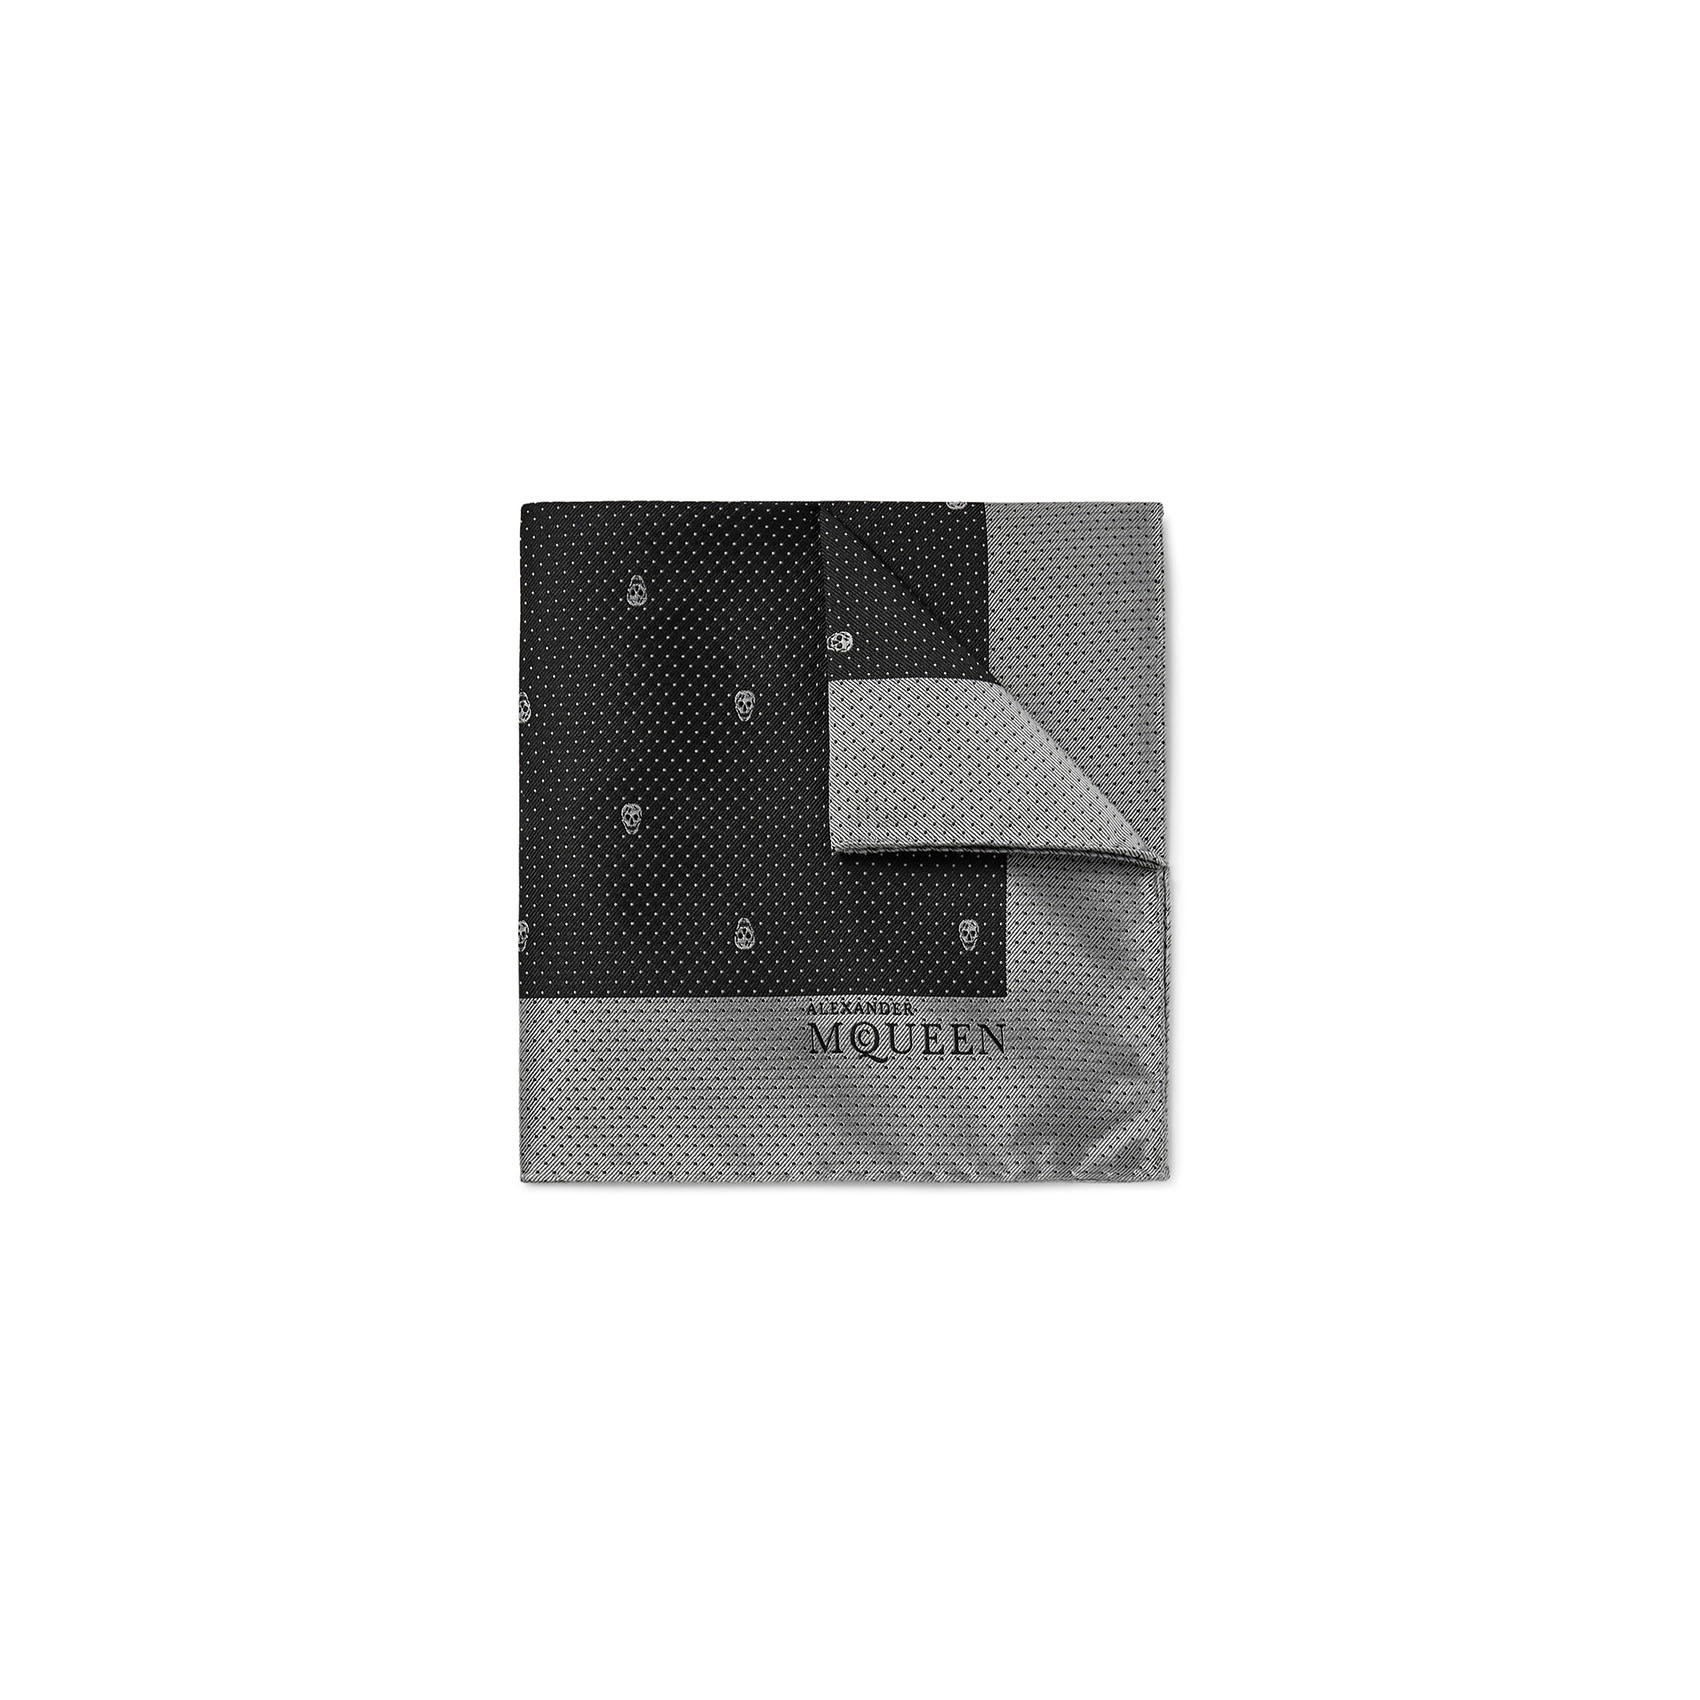 Alexander McQueen Pocket Square